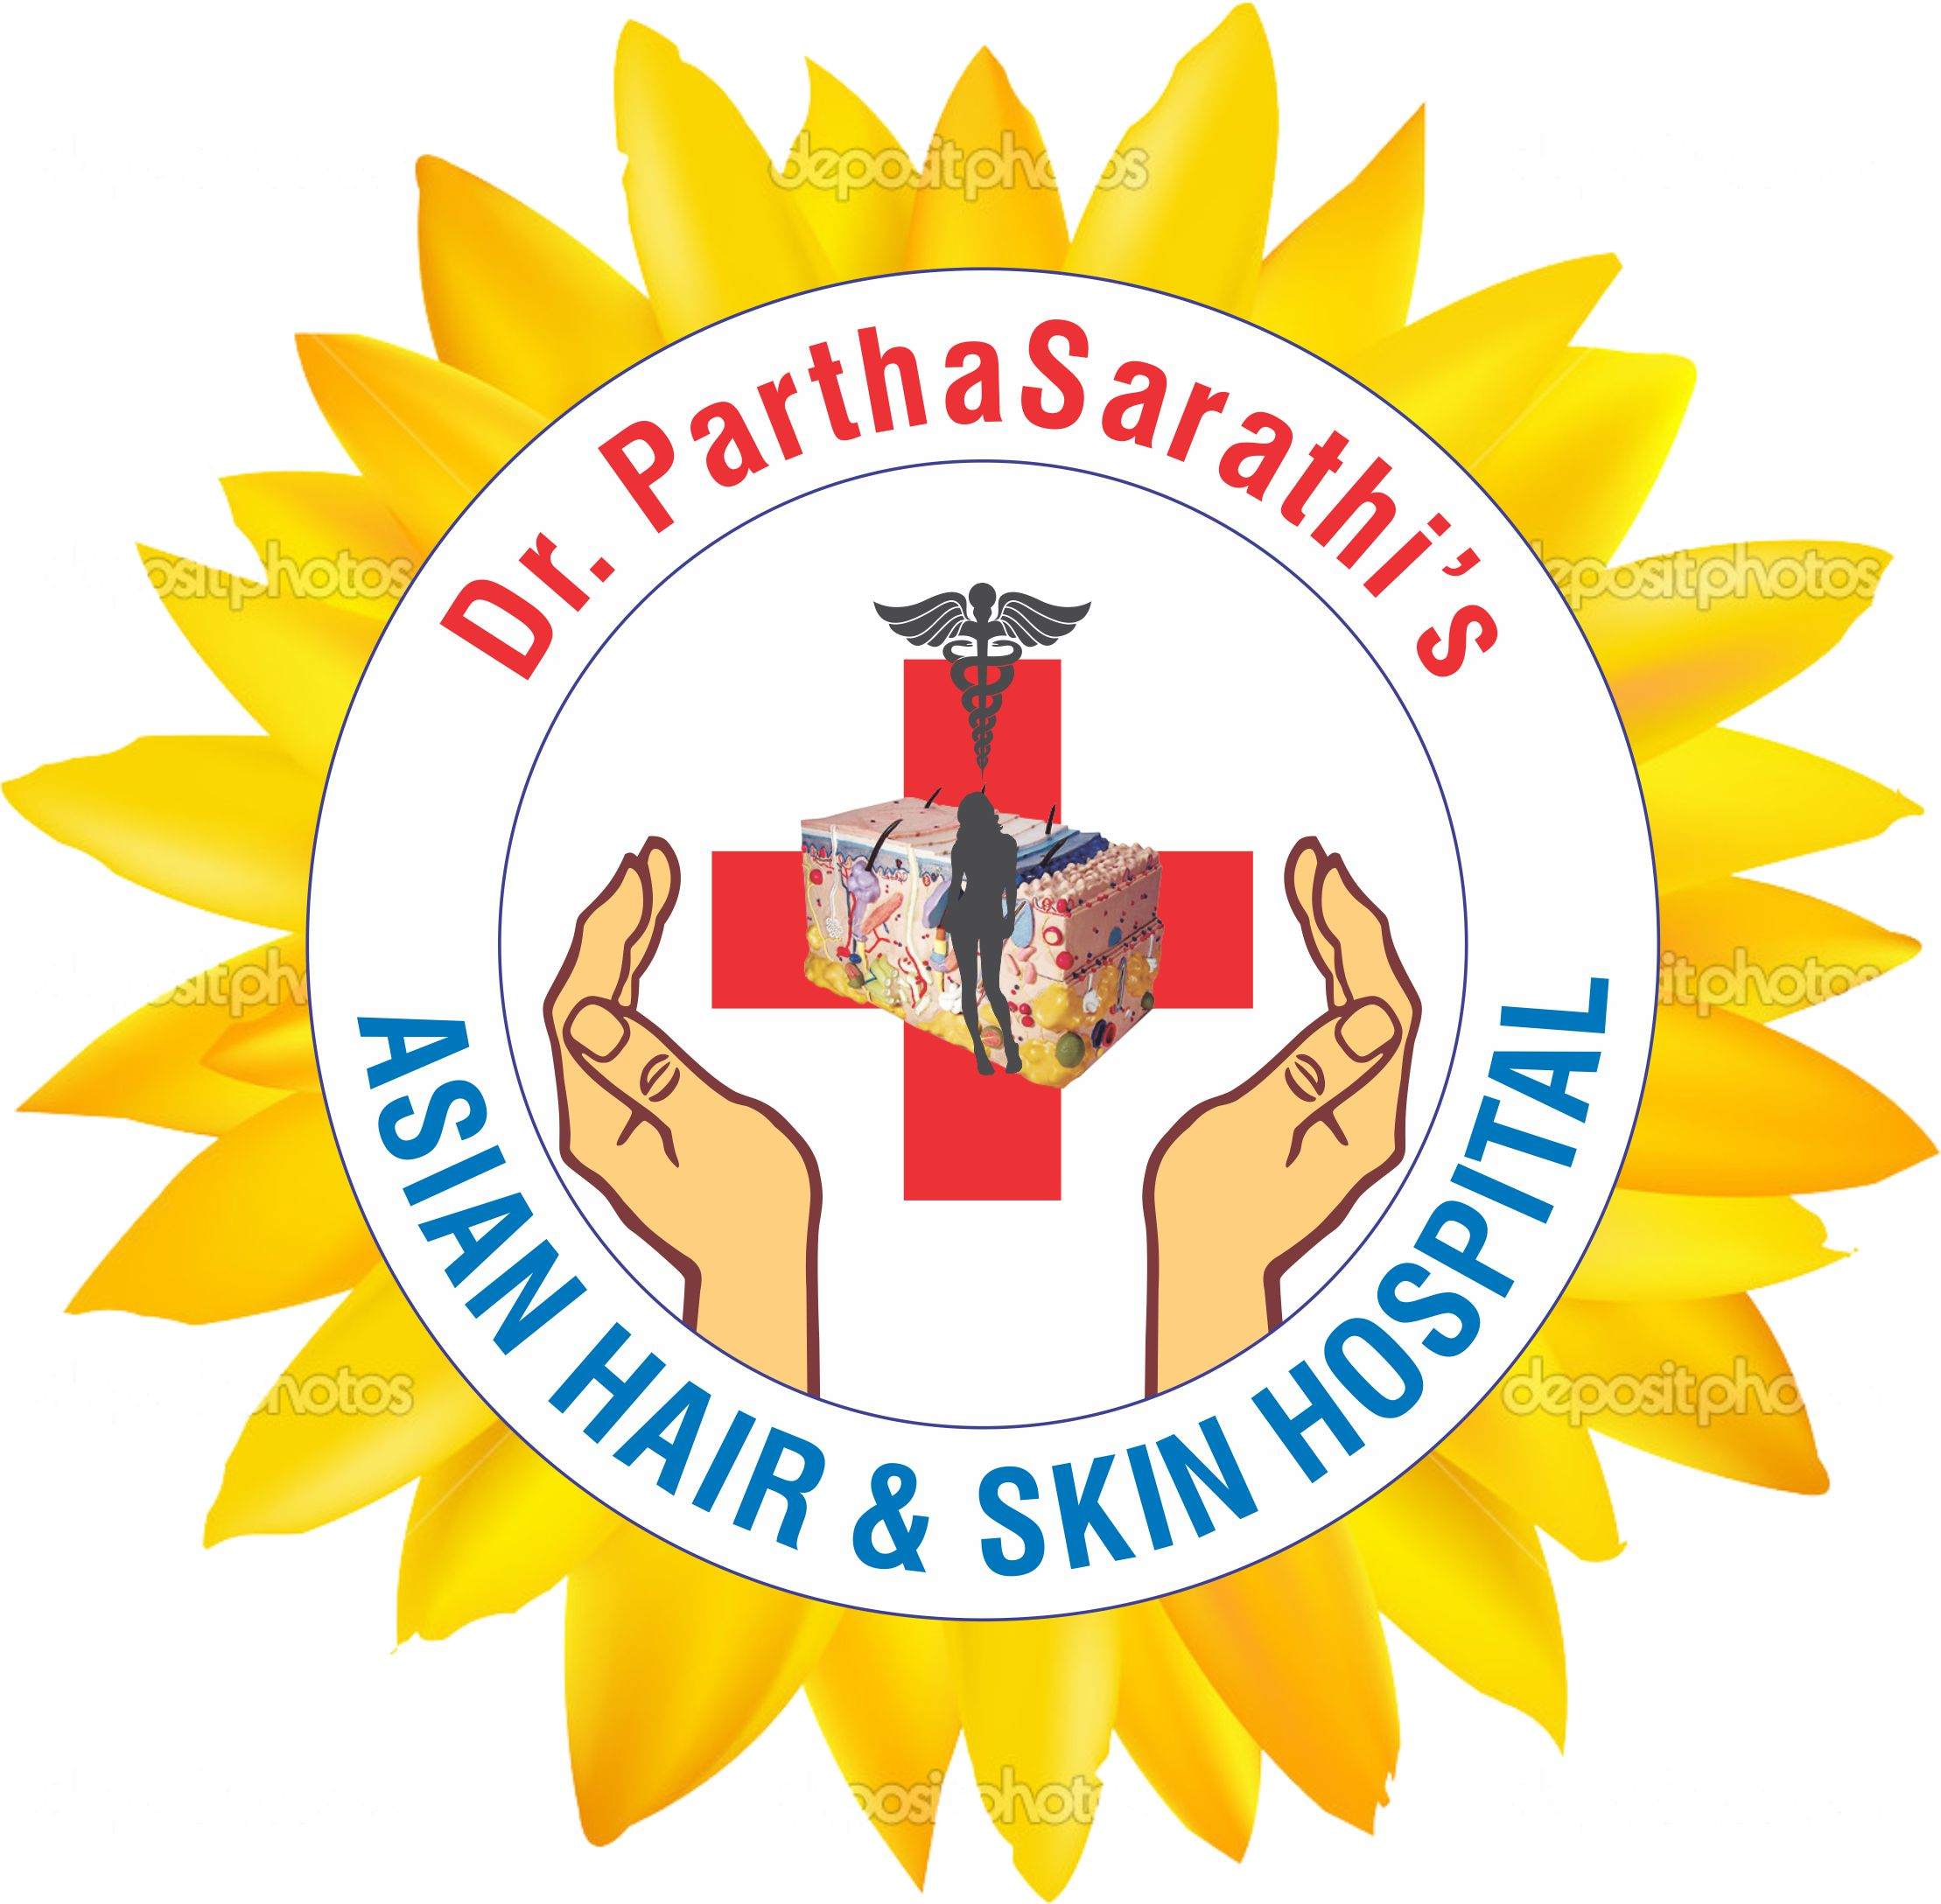 Dr. Partha Sarathi's Asian Hair and Skin Hospital